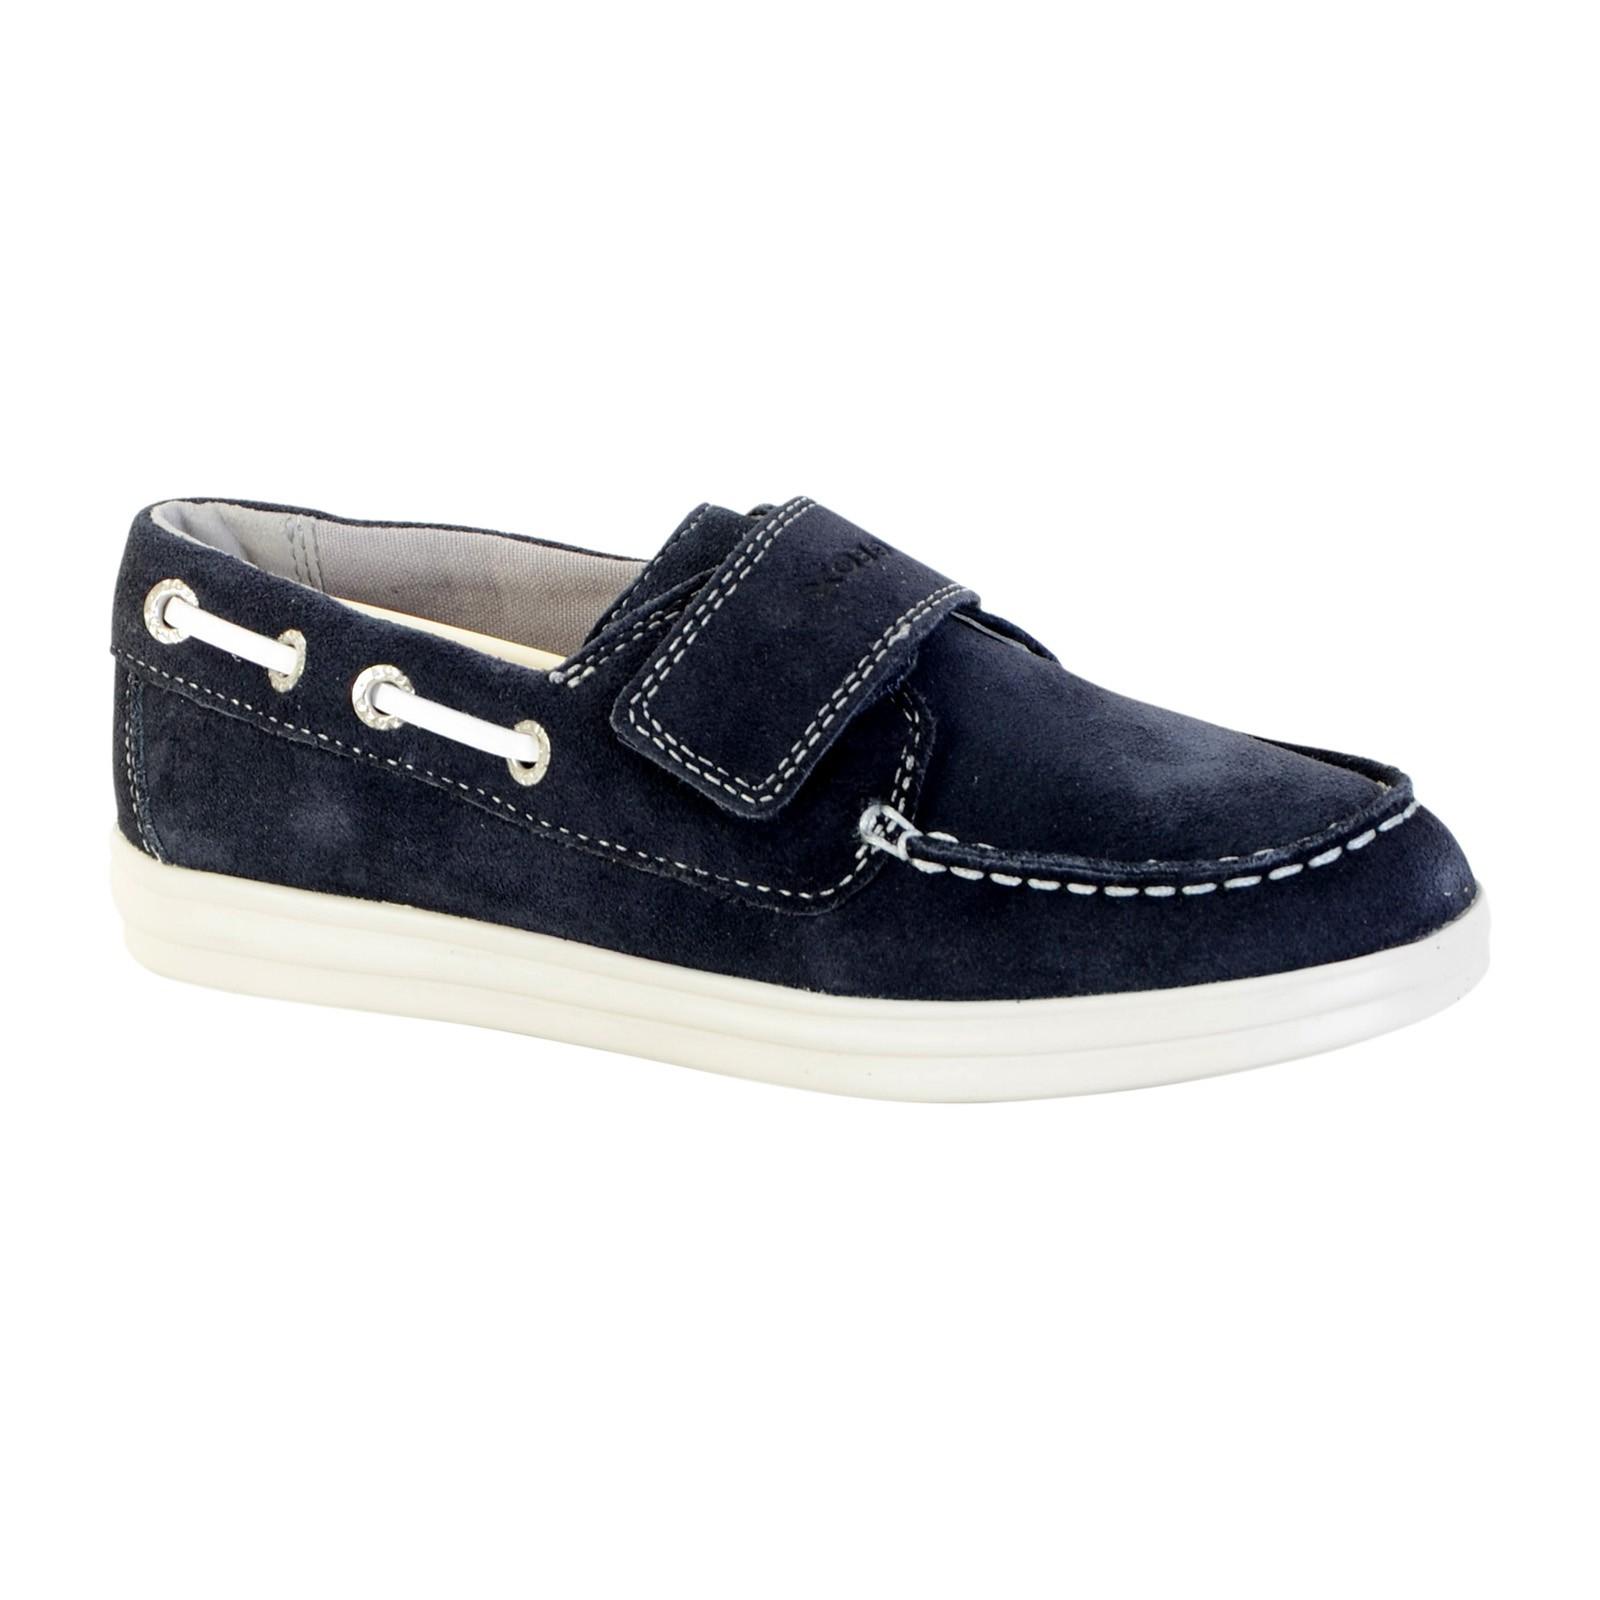 Chaussure-Geox-Enfant-J-Anthor miniature 4